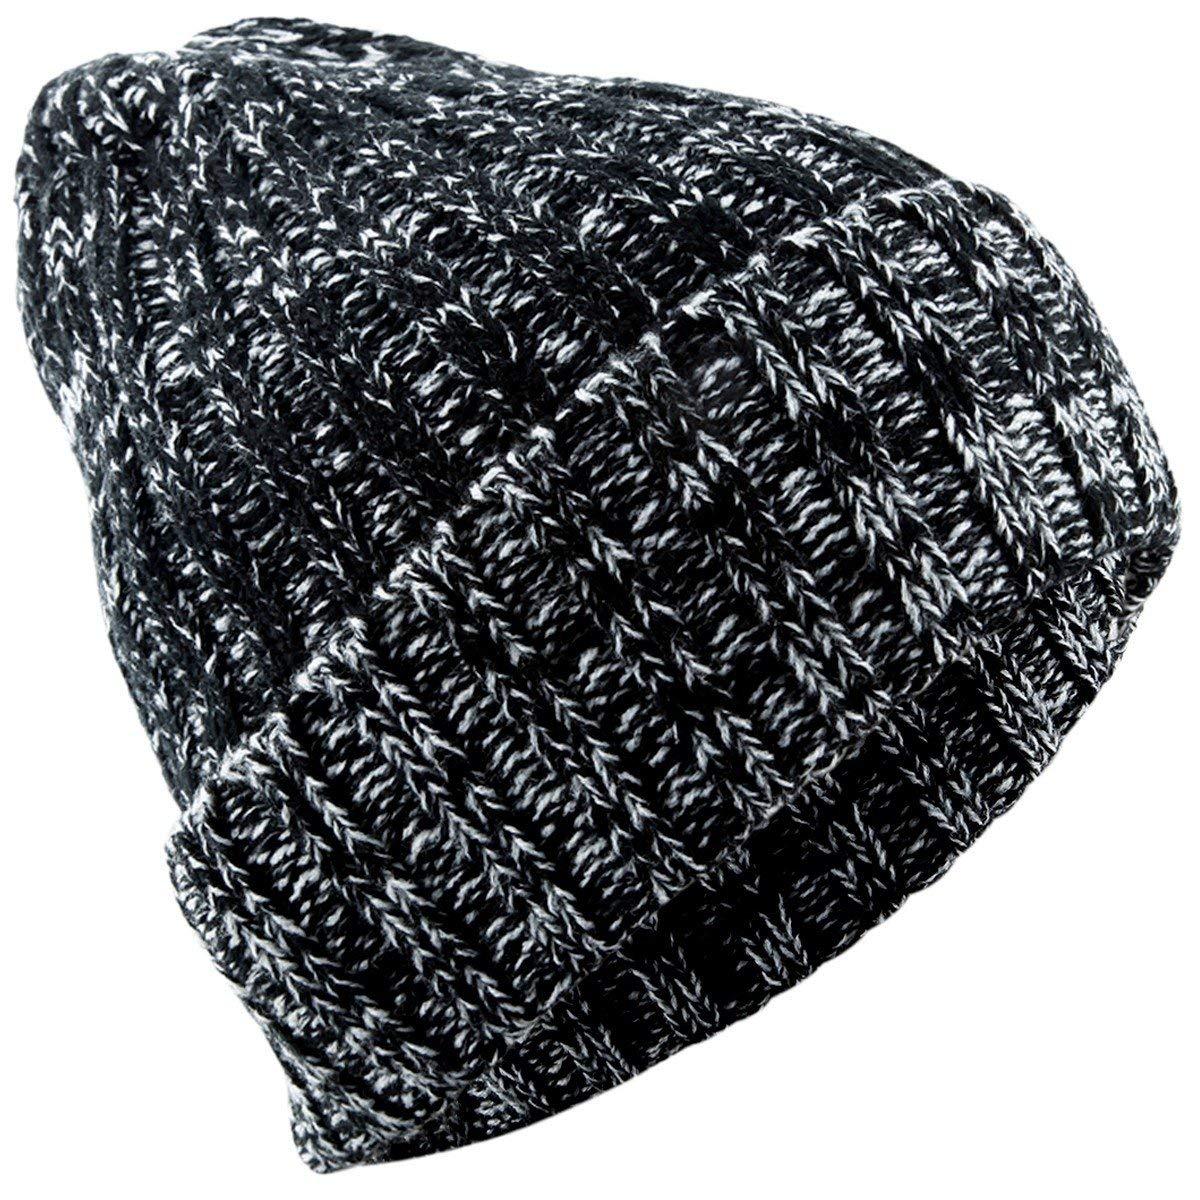 squaregarden Beanie Hats for Men Women,Winter Warm Baggy Ski Hat Knit Slouchy Cap